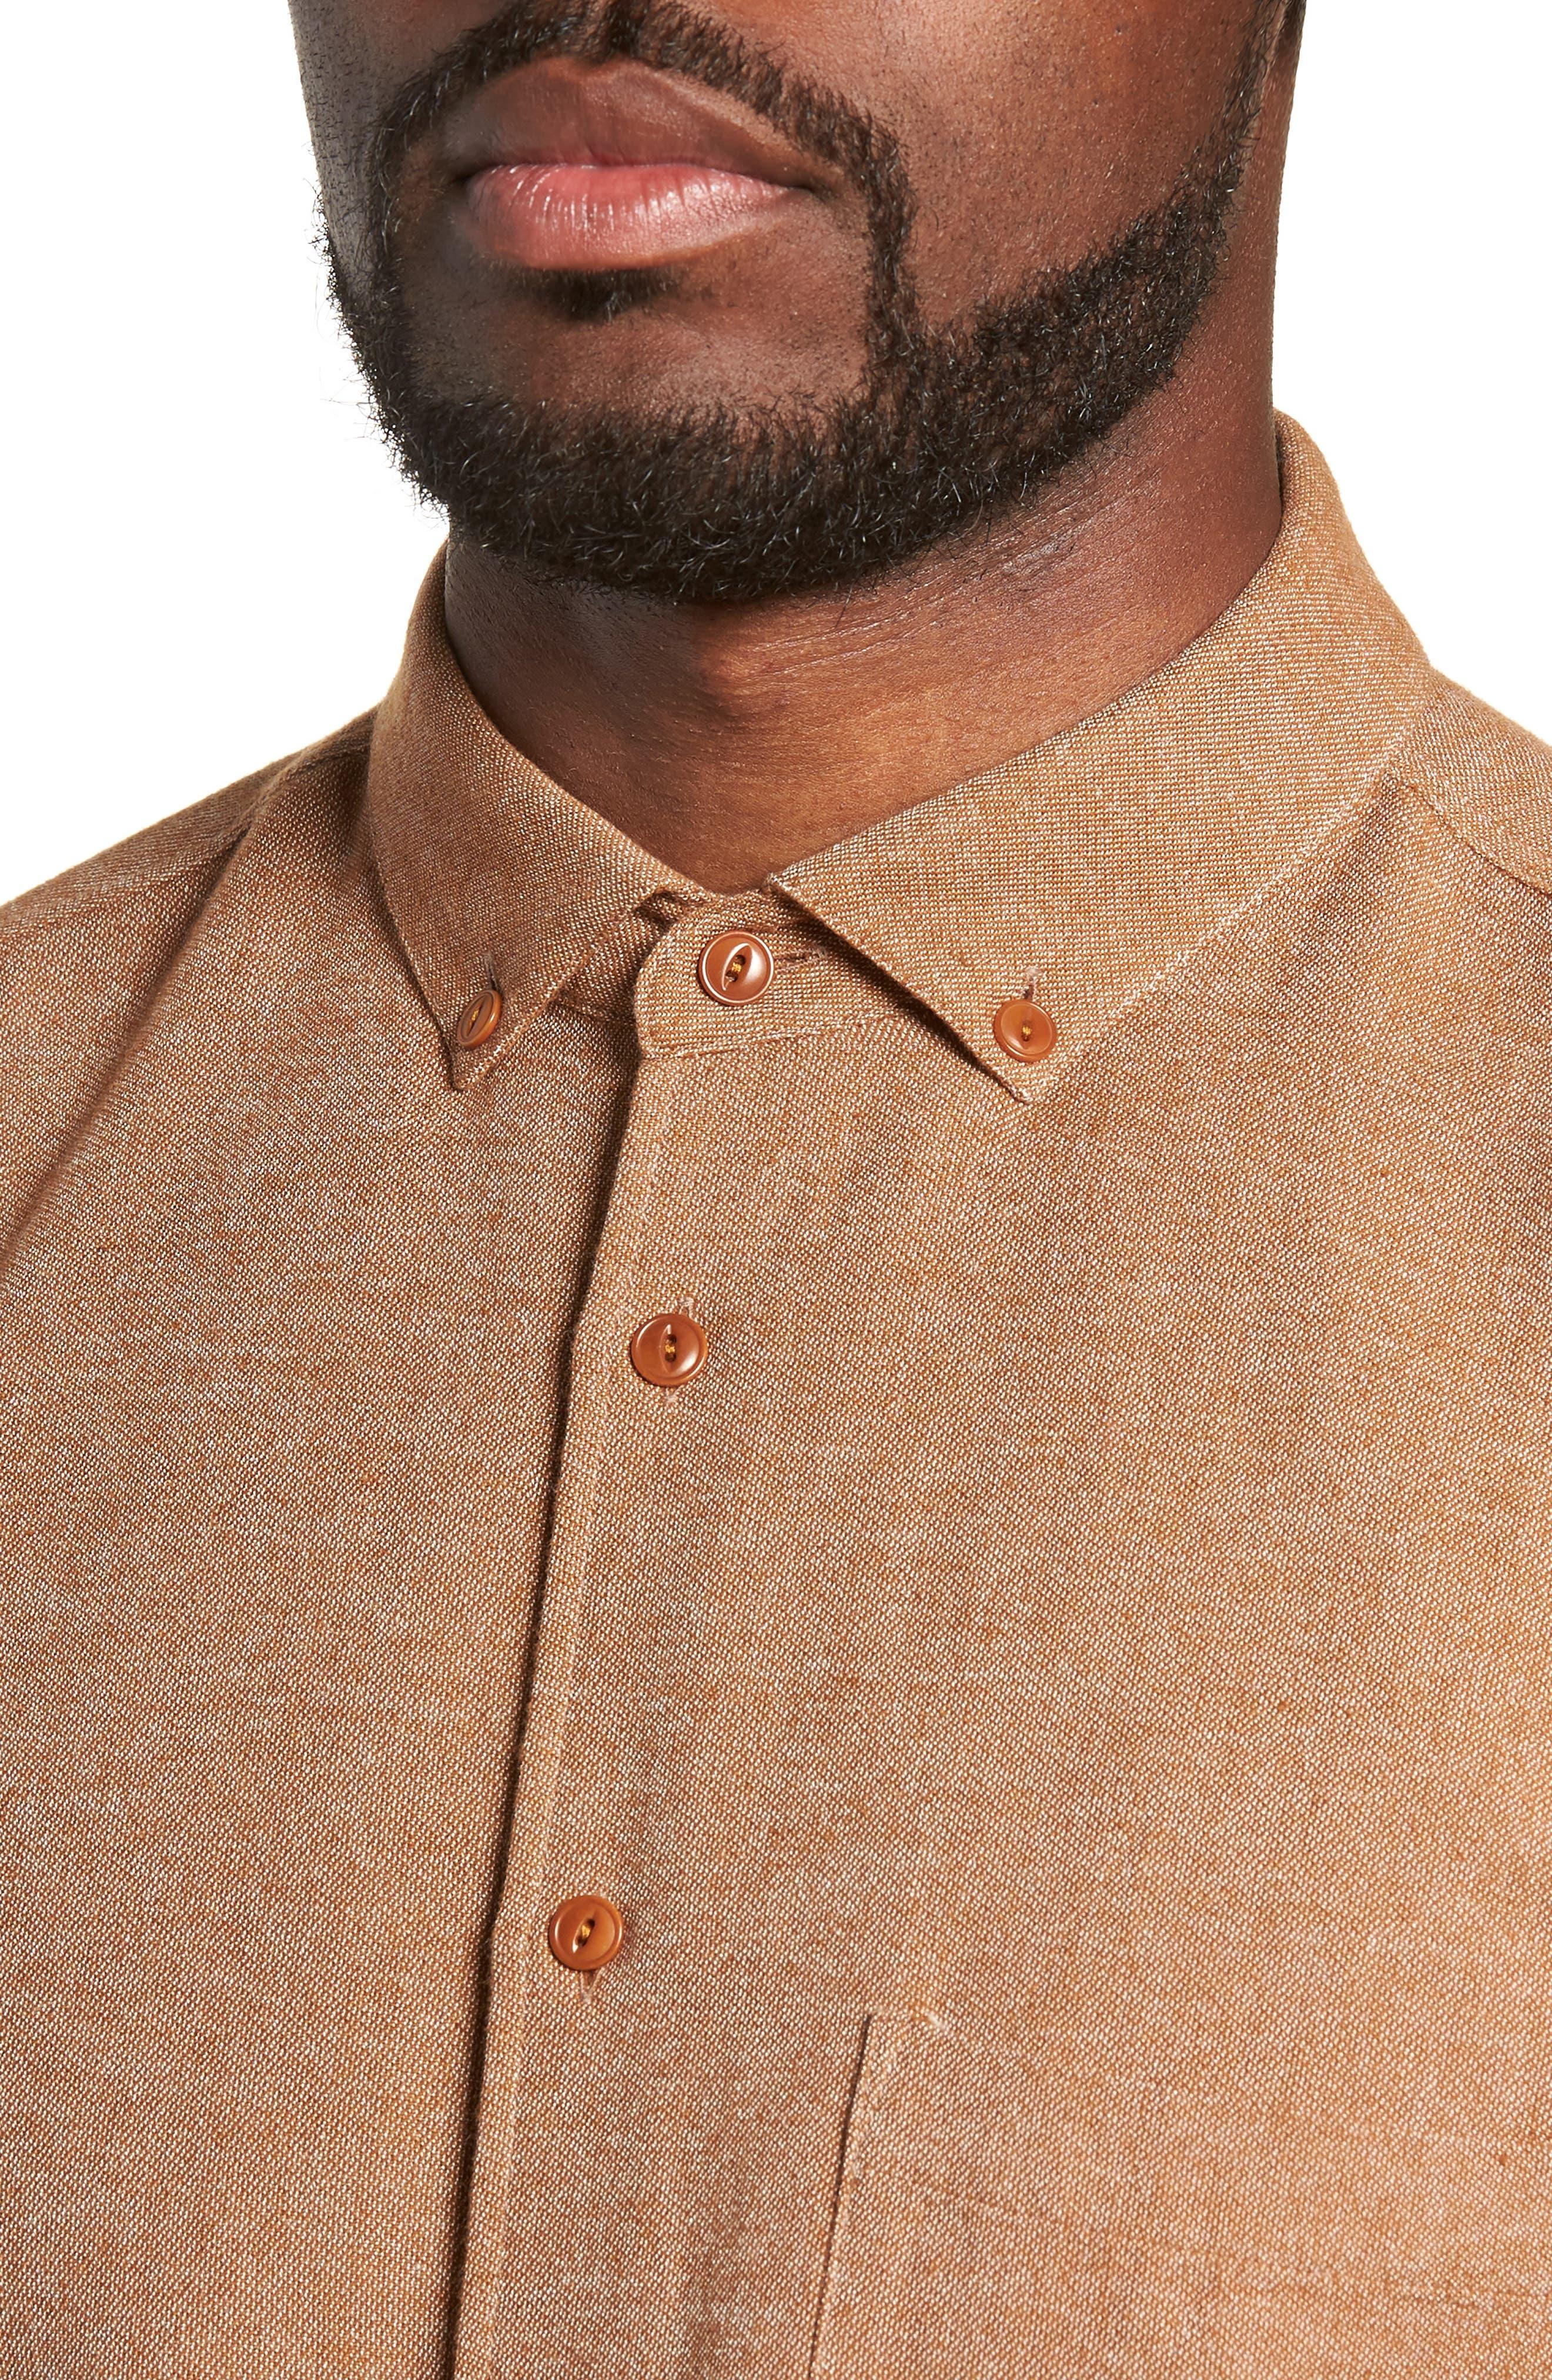 Dean Regular Fit Chambray Shirt,                             Alternate thumbnail 2, color,                             200